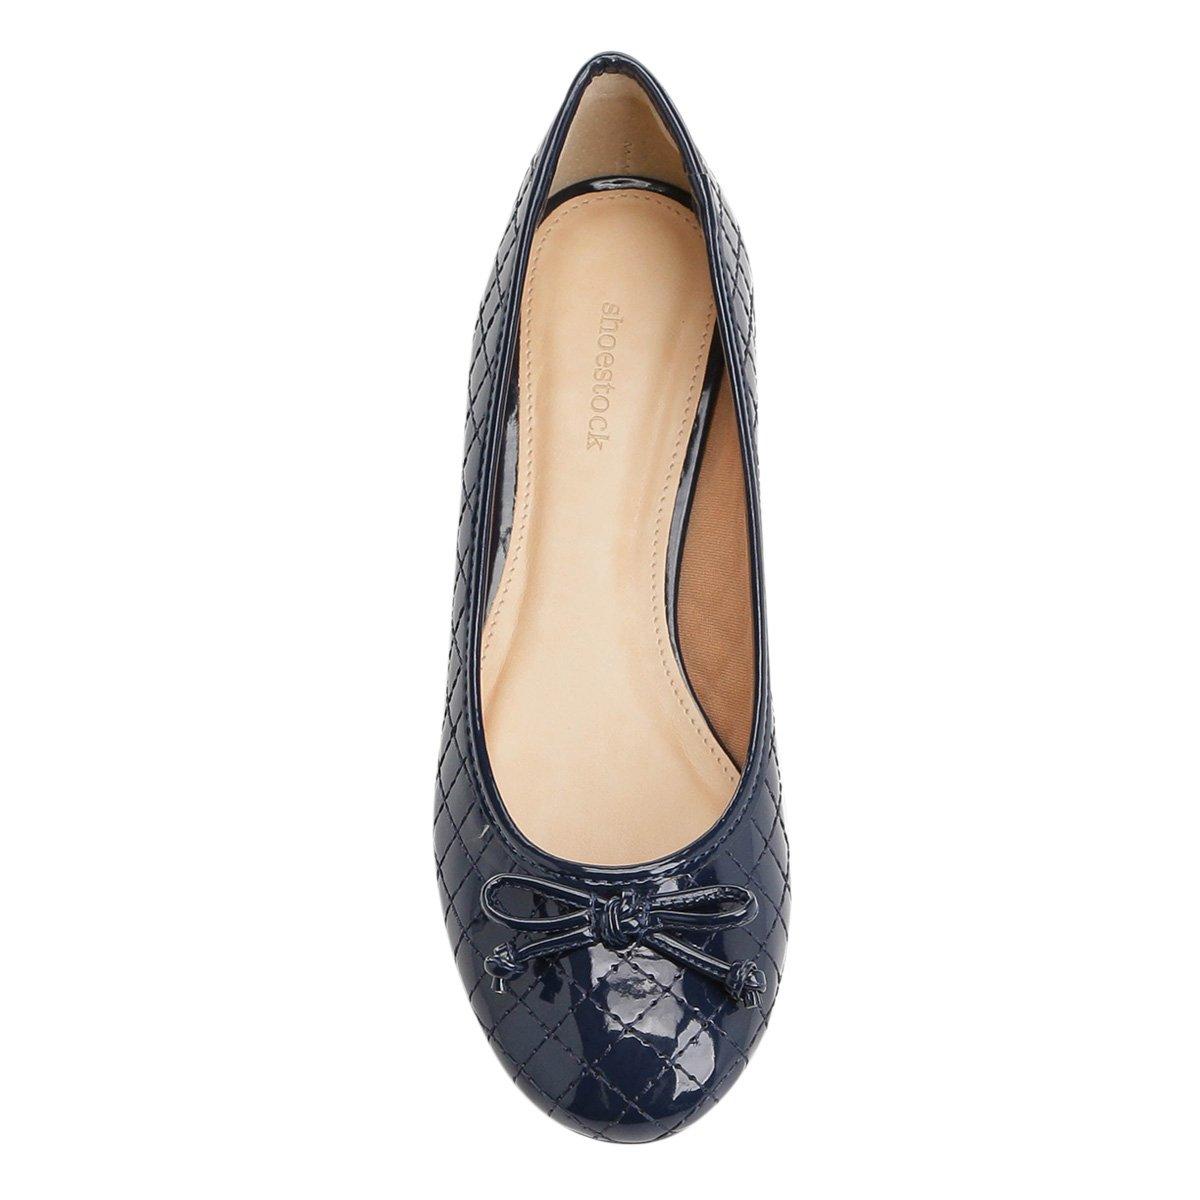 Sapatilha Feminina Sapatilha Verniz Shoestock Shoestock Matelassê Marinho qdHfUTwU